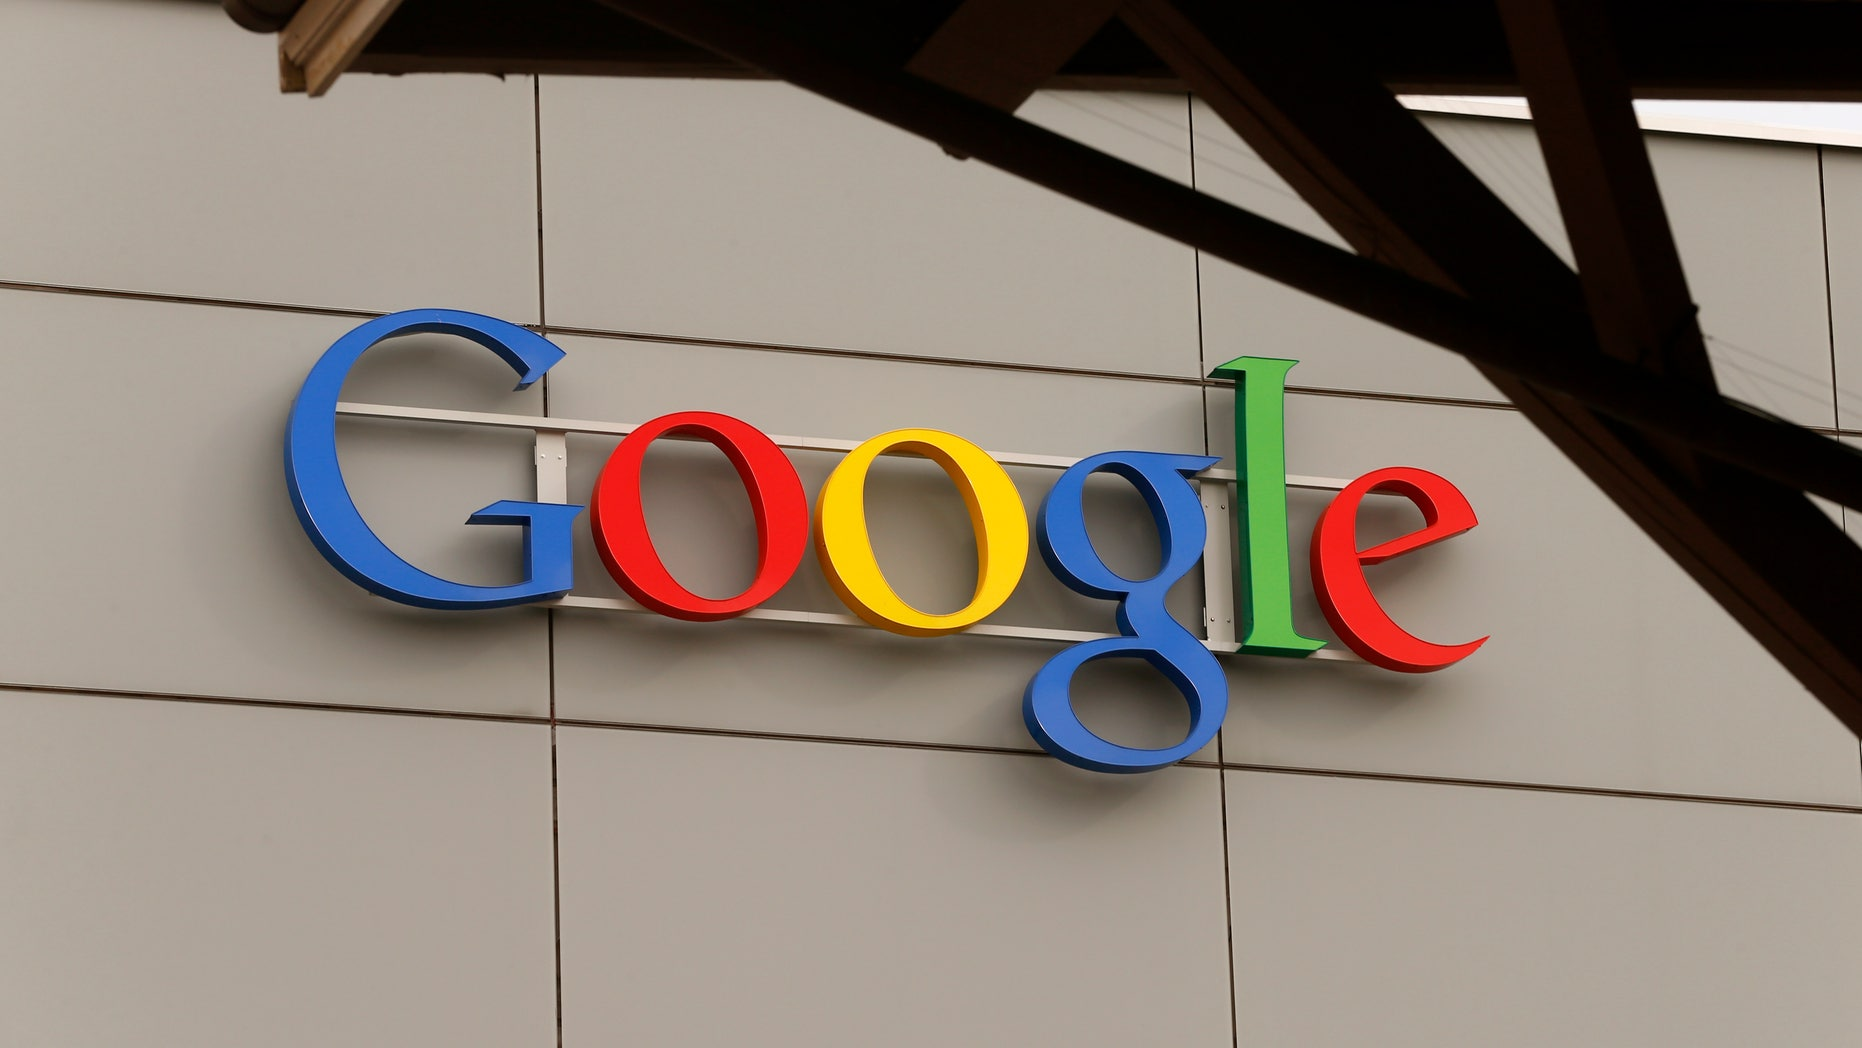 A logo is pictured at Google's European Engineering Center in Zurich April16, 2015. (REUTERS/Arnd Wiegmann)